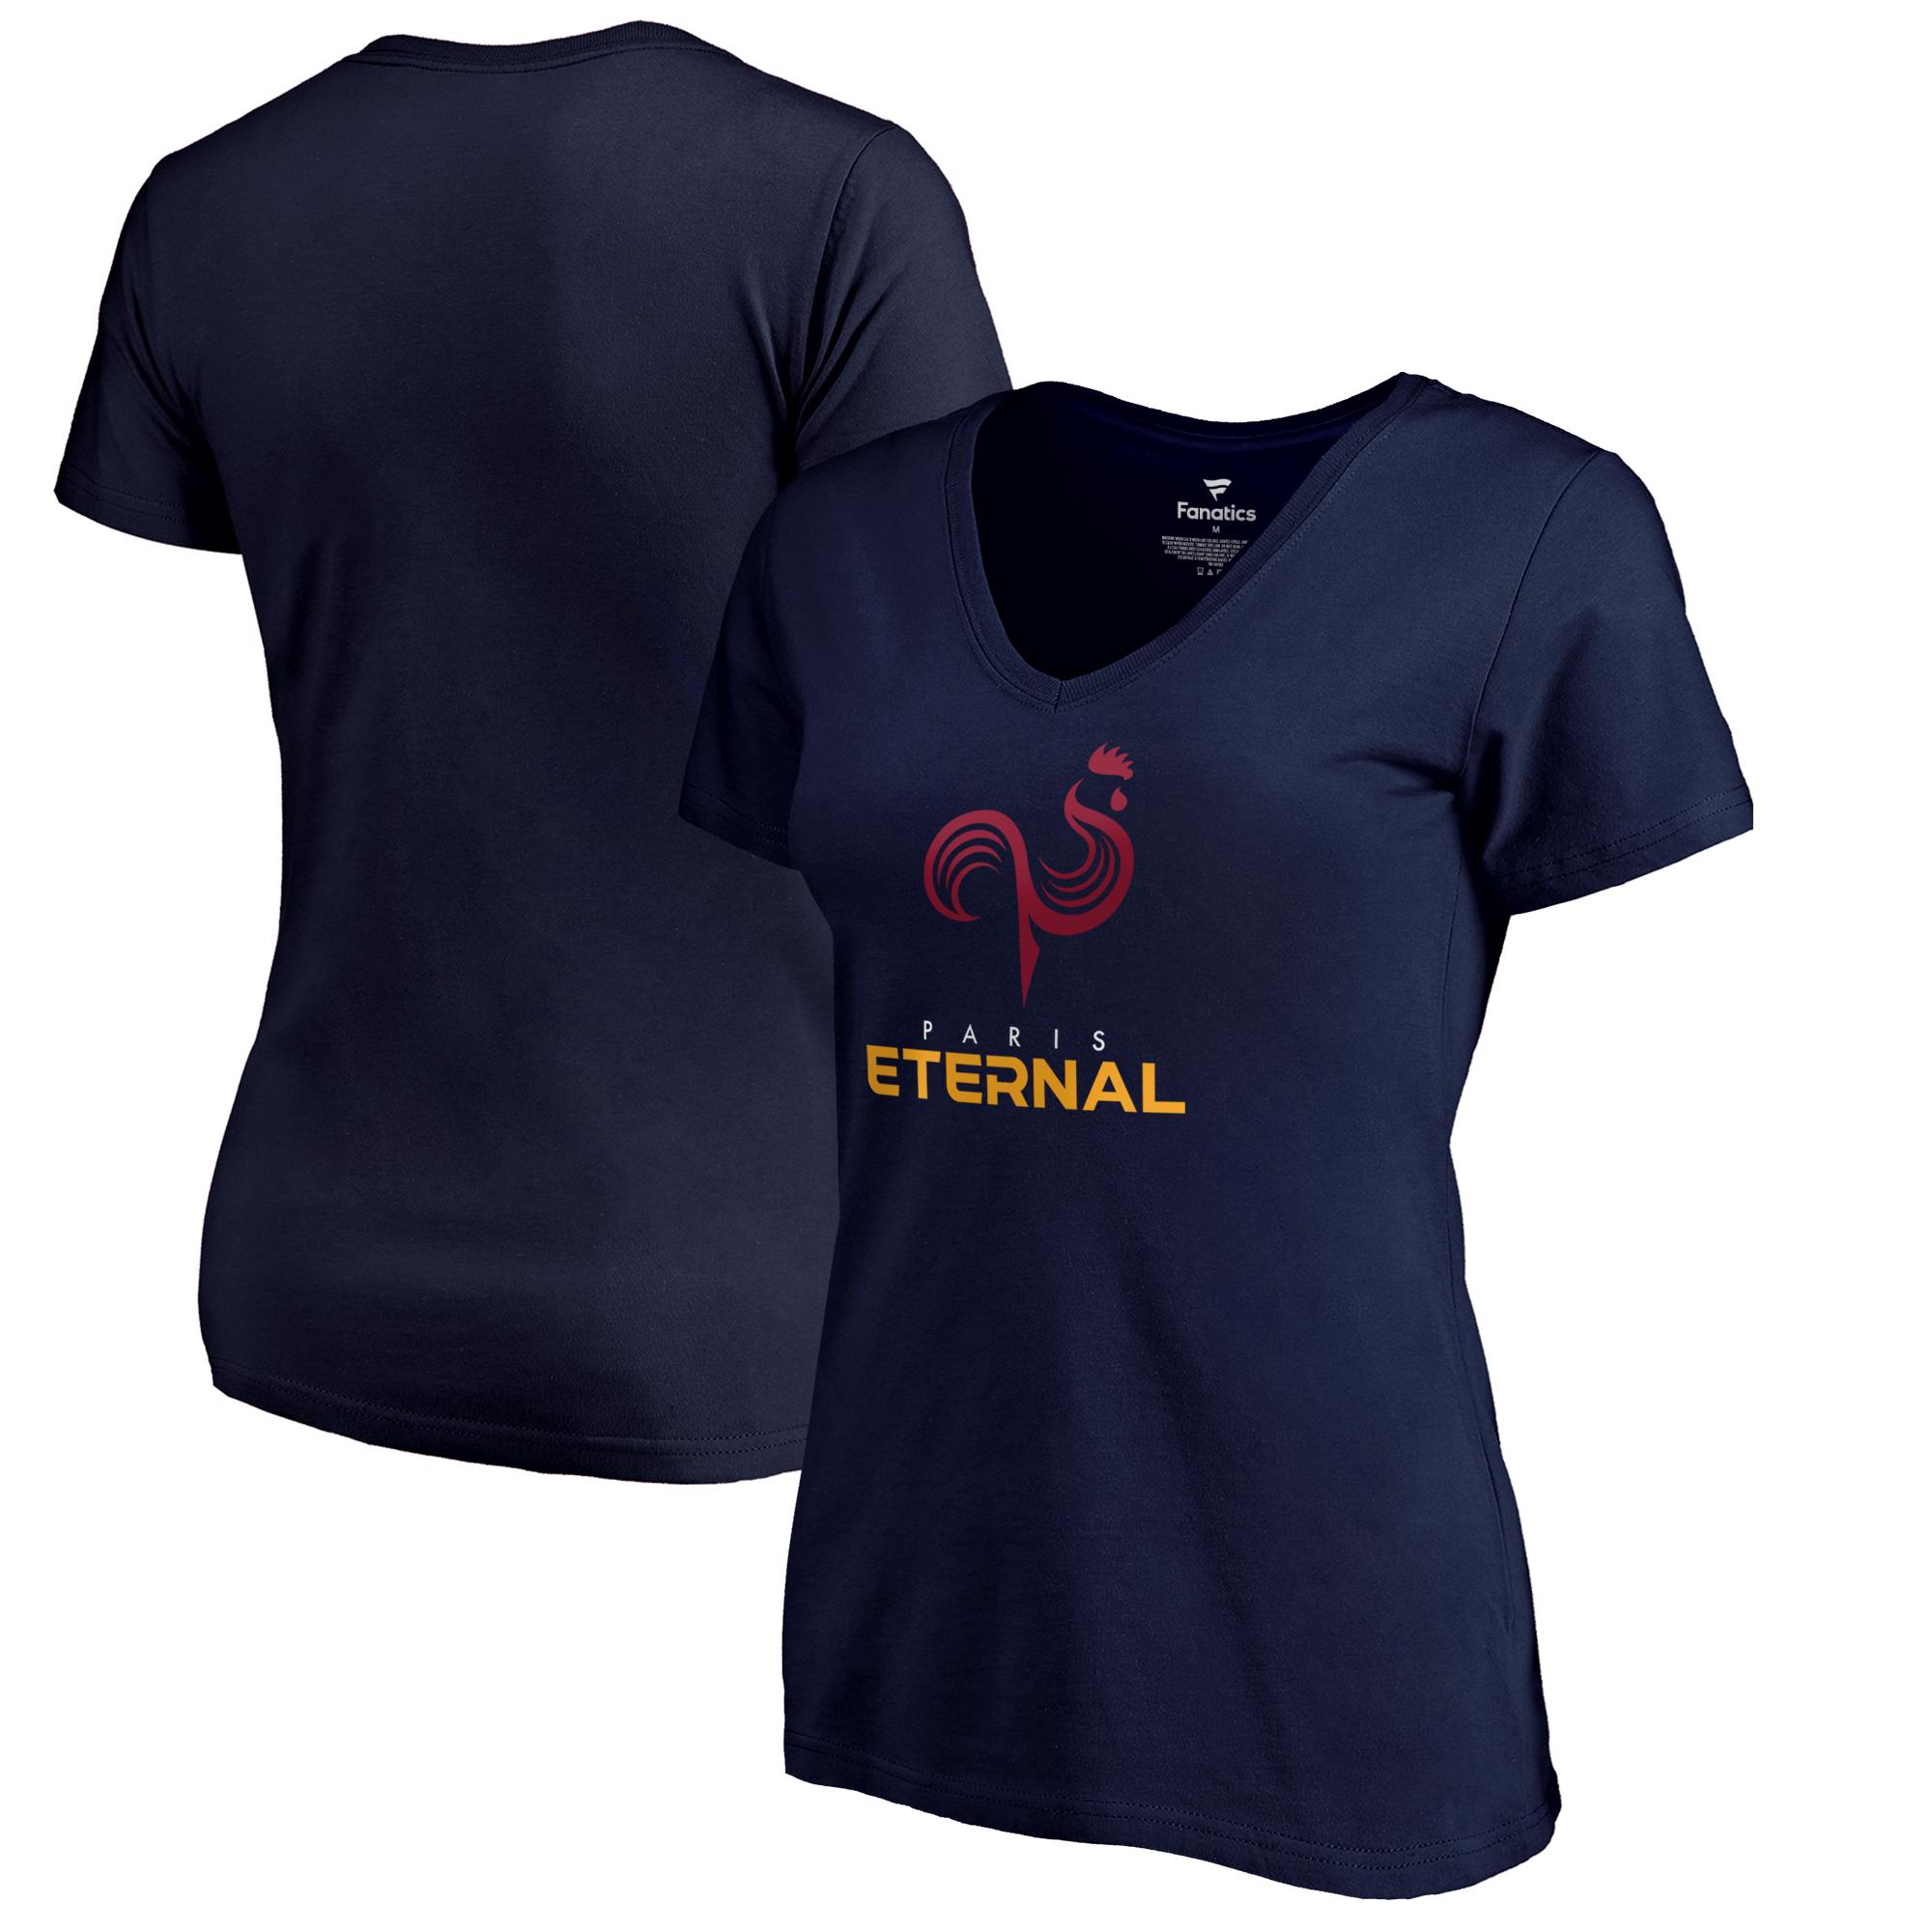 Paris Eternal Fanatics Branded Women's Team Identity V-Neck T-Shirt - Navy